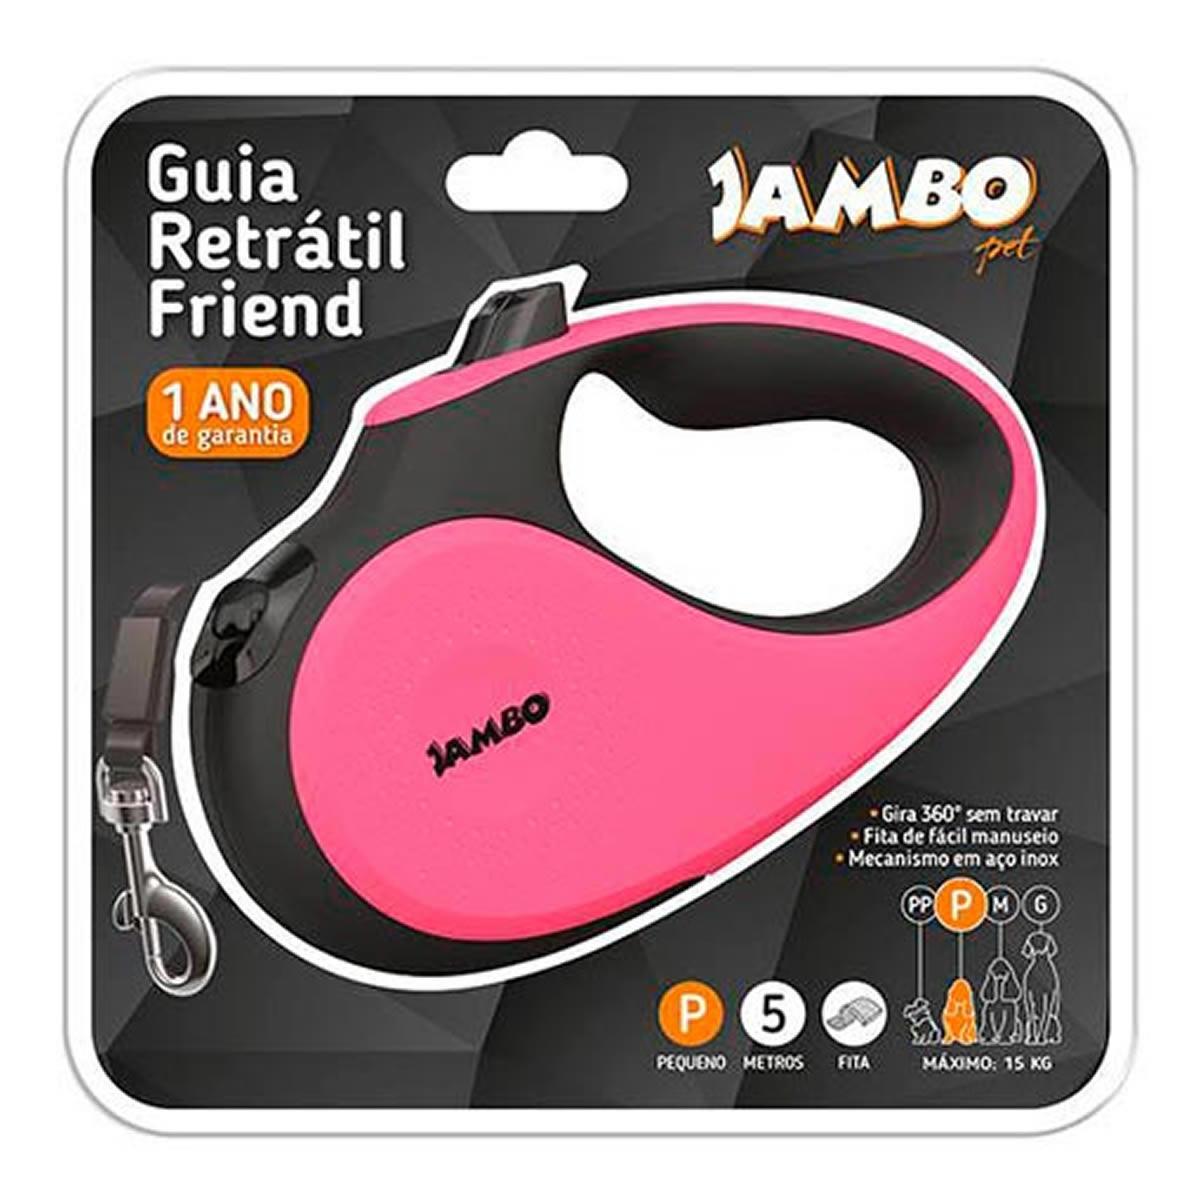 Guia Retrátil Friend Jambo Pet Rosa